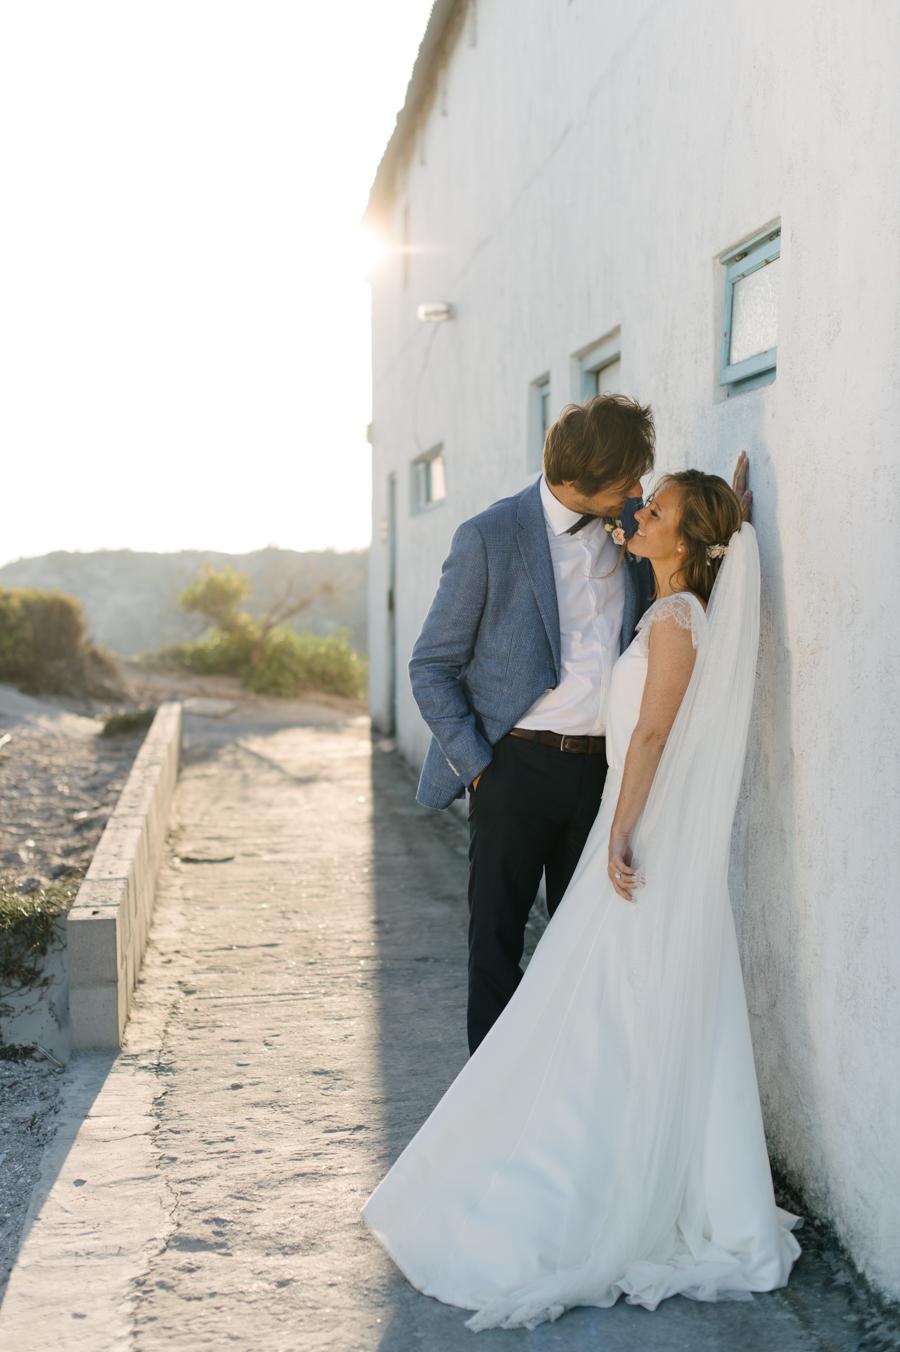 A Beautiful Beachy Wedding With Rustic Beach Wood, Coral & Peach ...